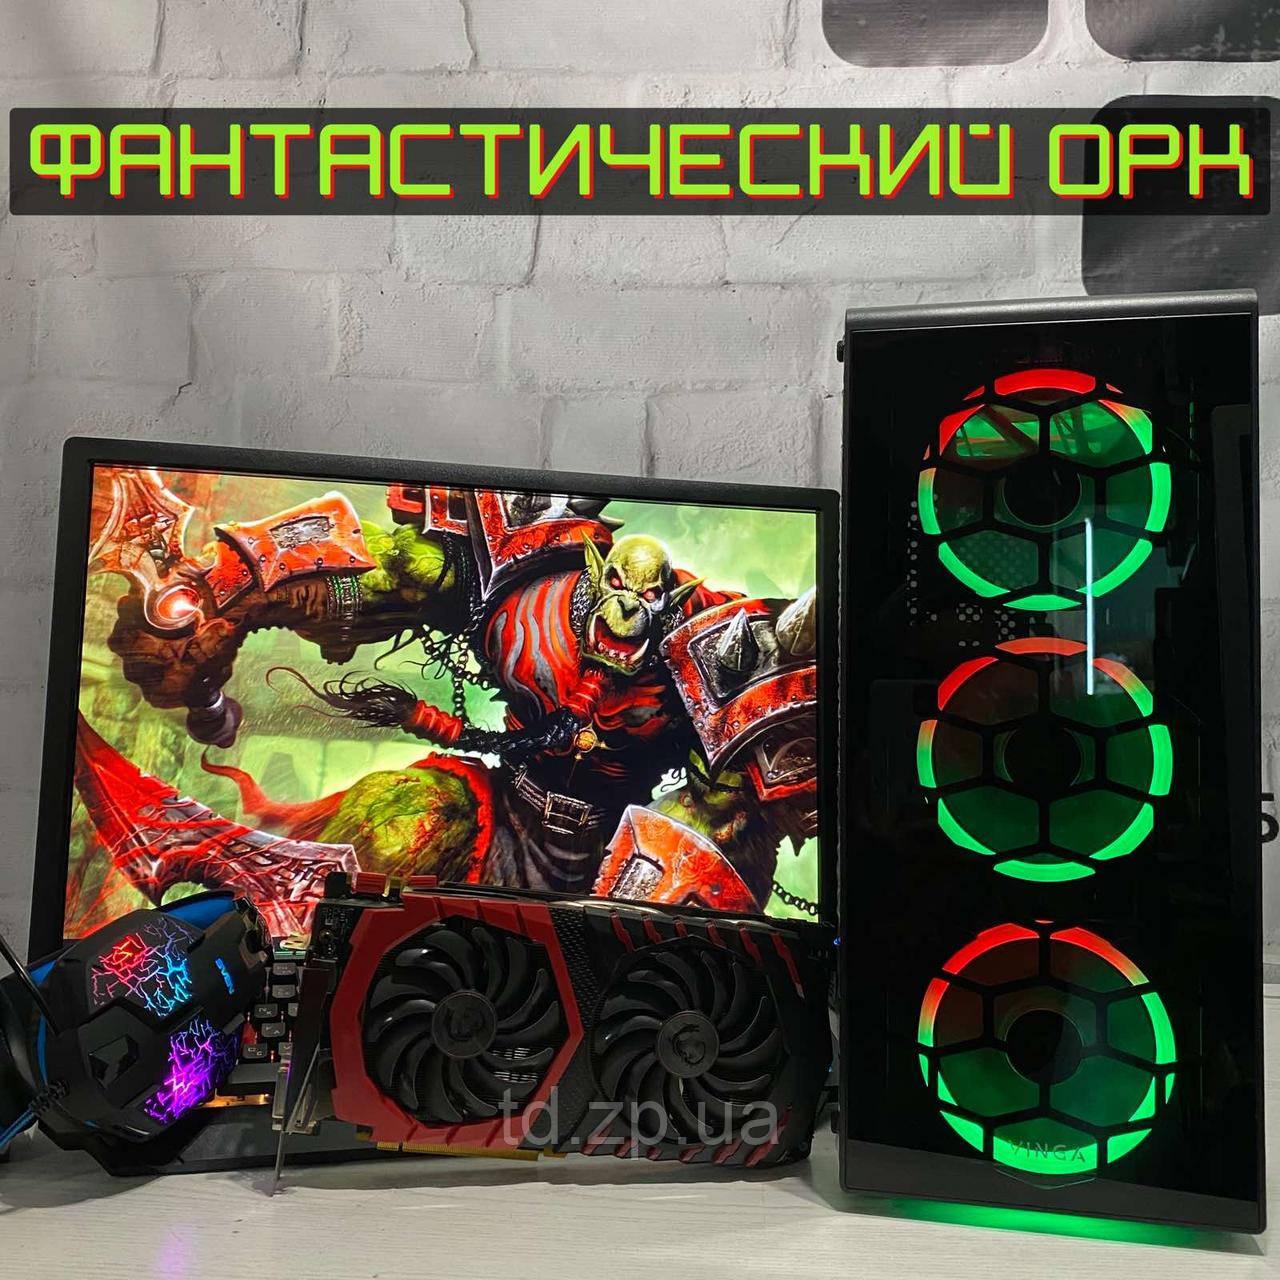 Игровой компьютер Ryzen 5 3600 + NVIDIA GTX 1070 8Gb + 16gb RAM + HDD 2Tb + SSD 120Gb